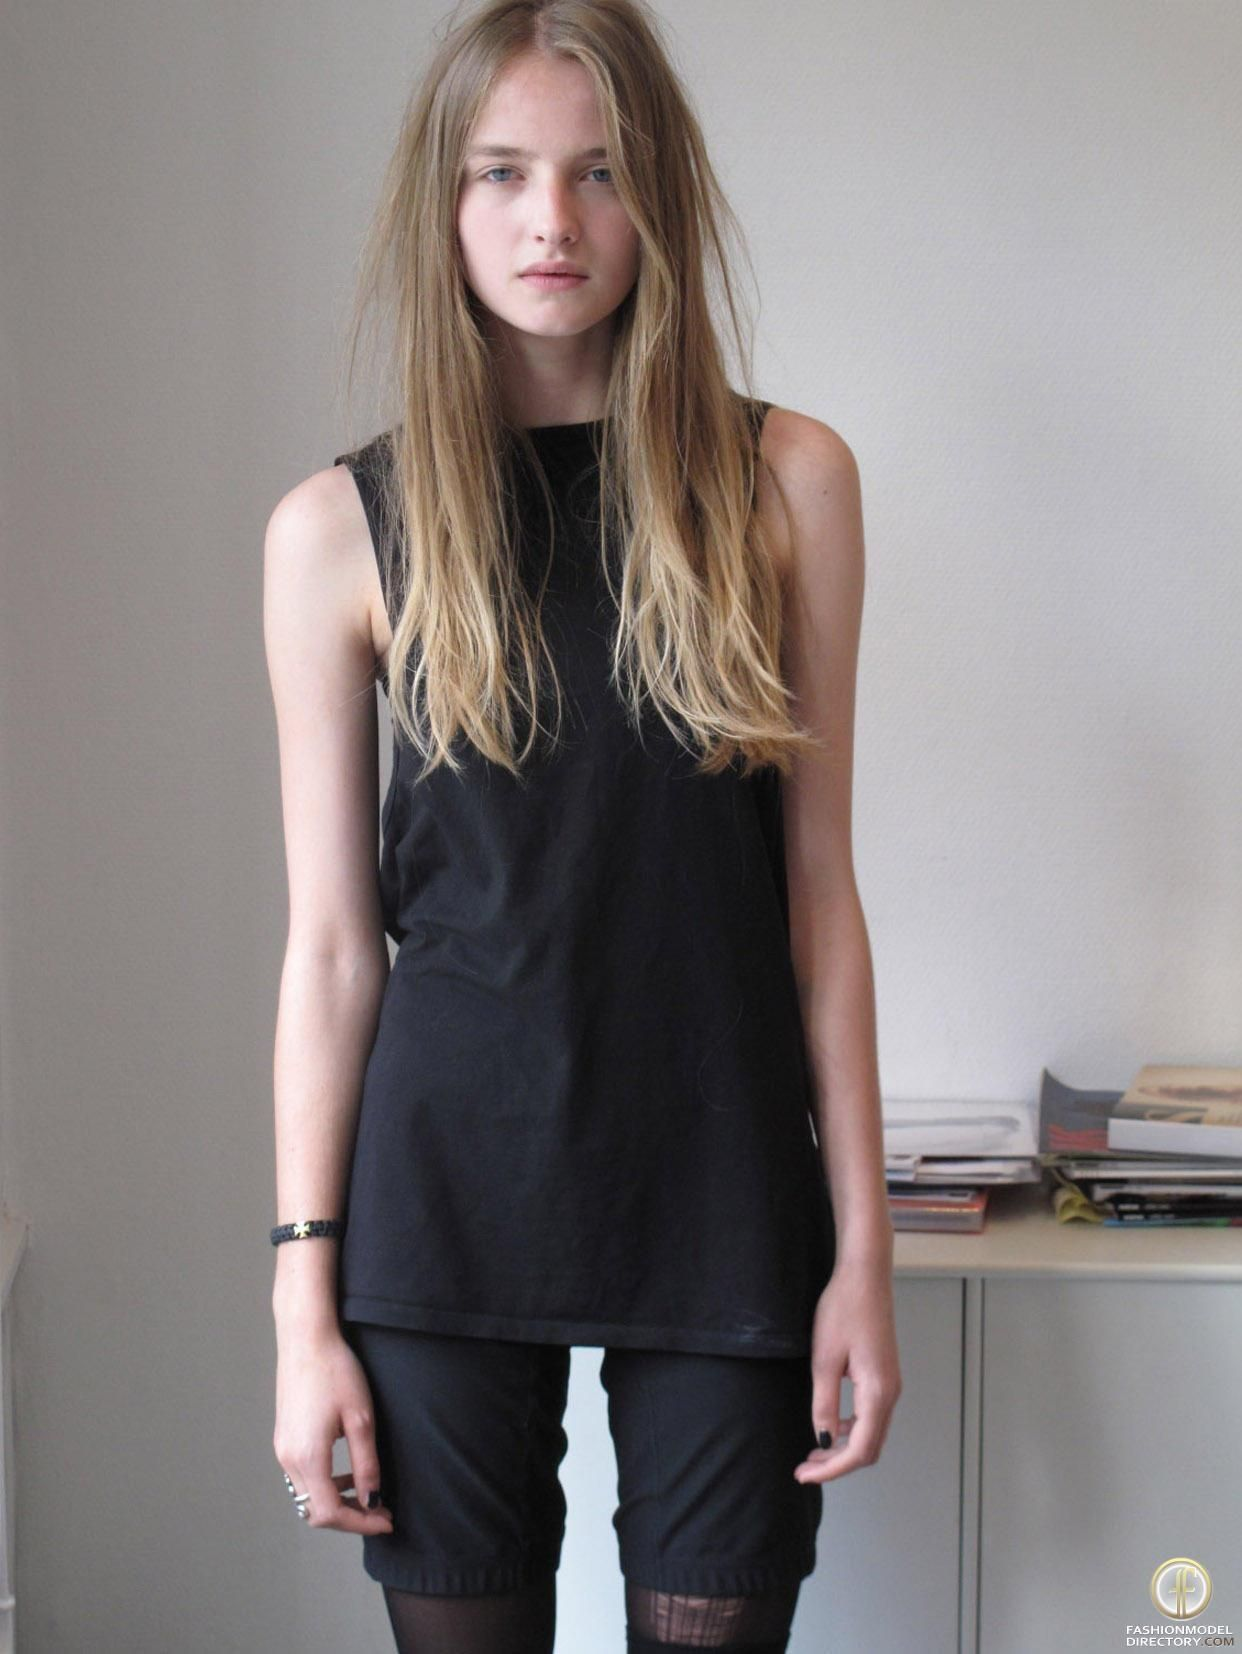 Amanda Norgaard nudes (37 fotos), pictures Sexy, Twitter, bra 2015